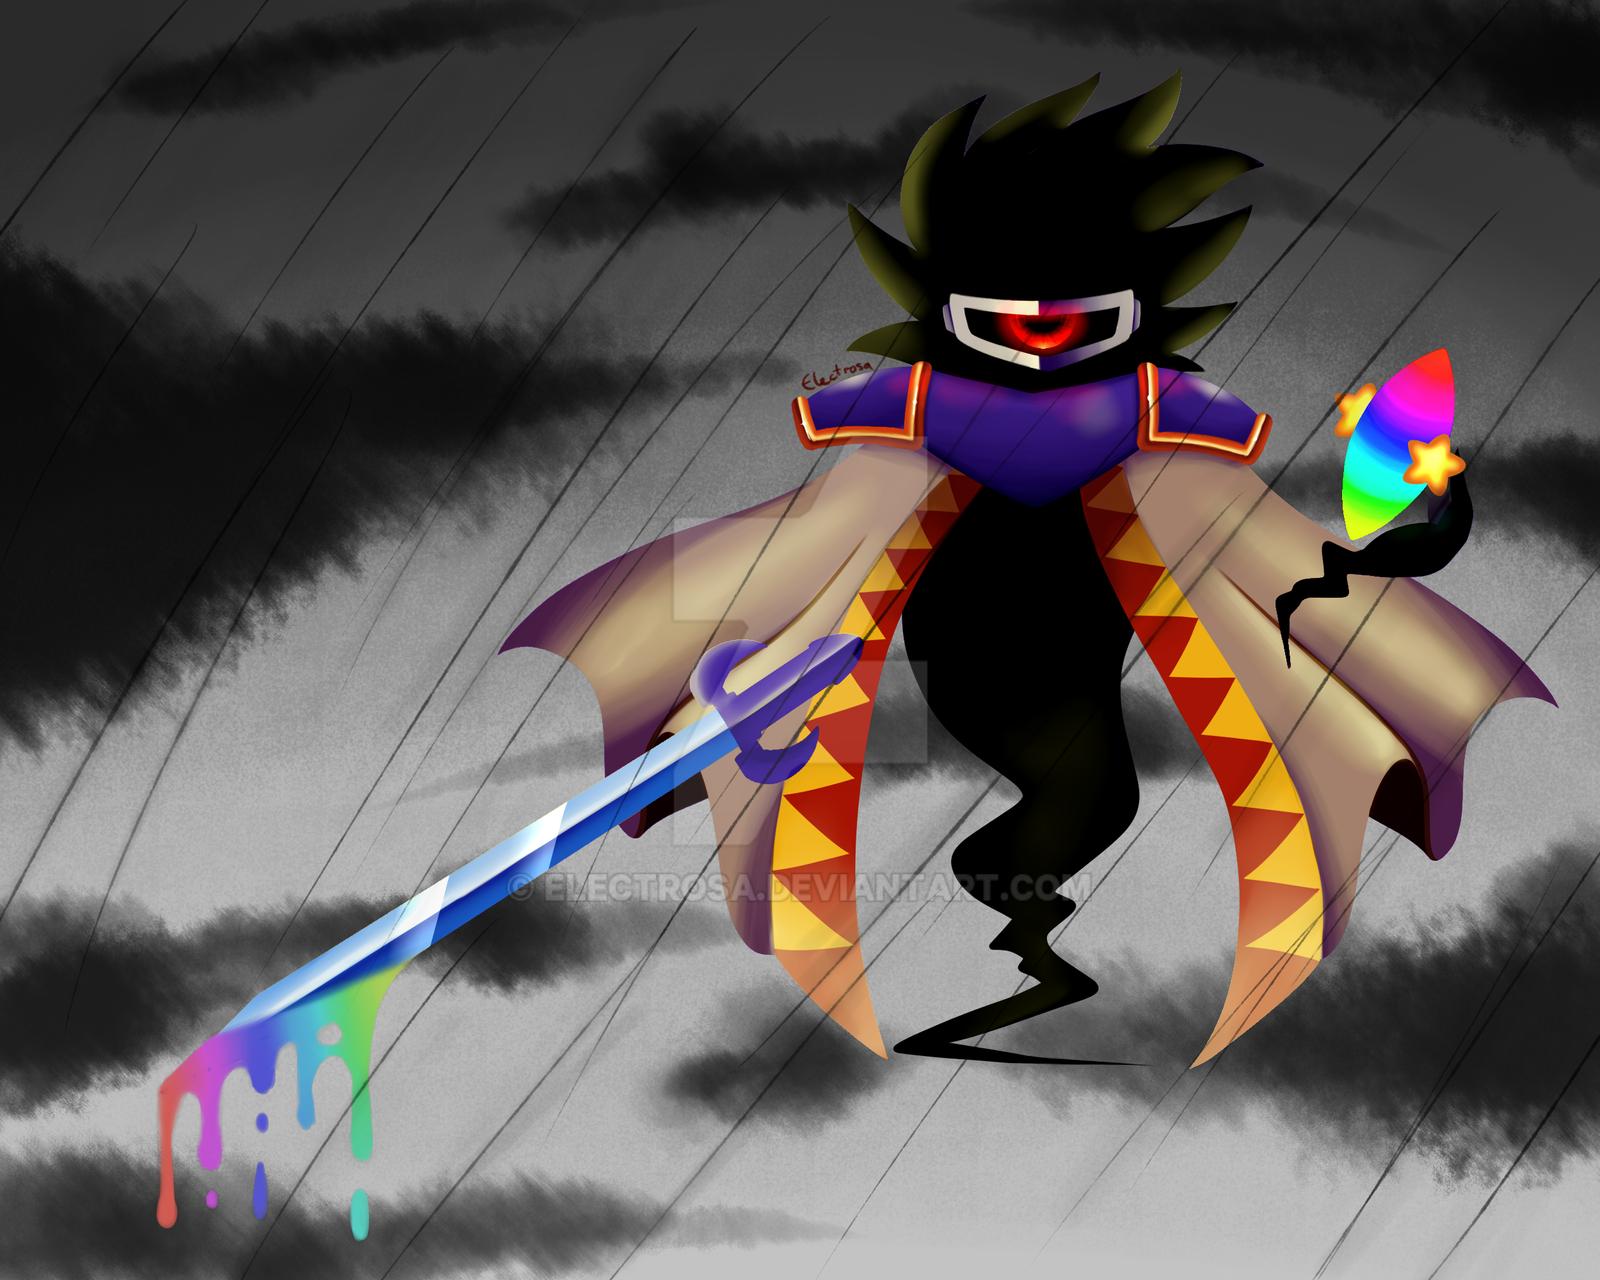 dark matter swordsman skylar - photo #24